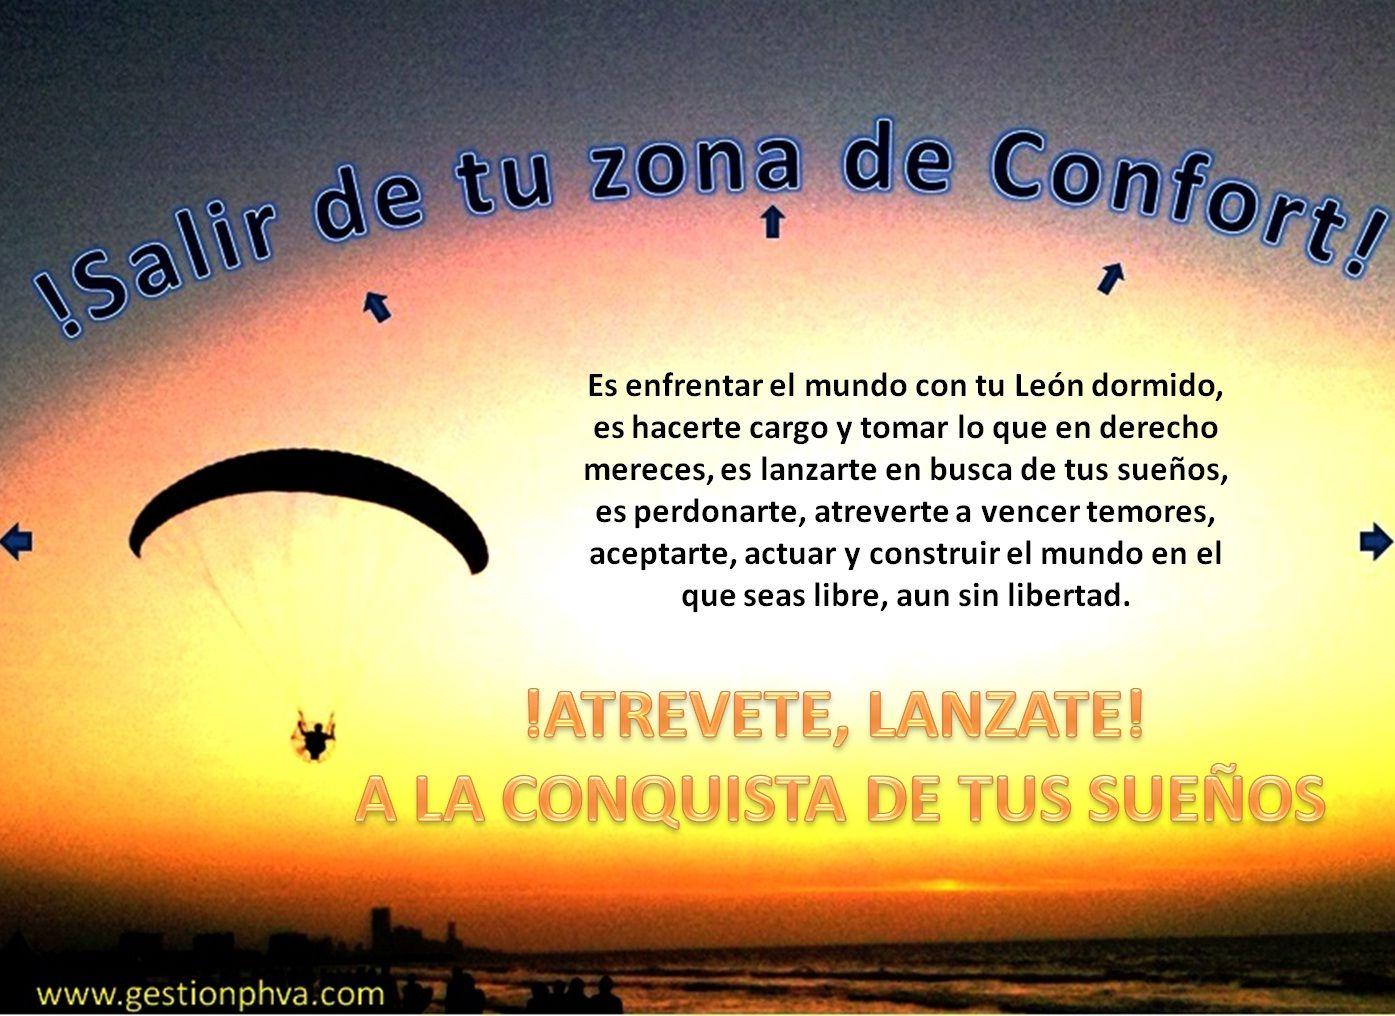 Salir de la Zona de Confort\